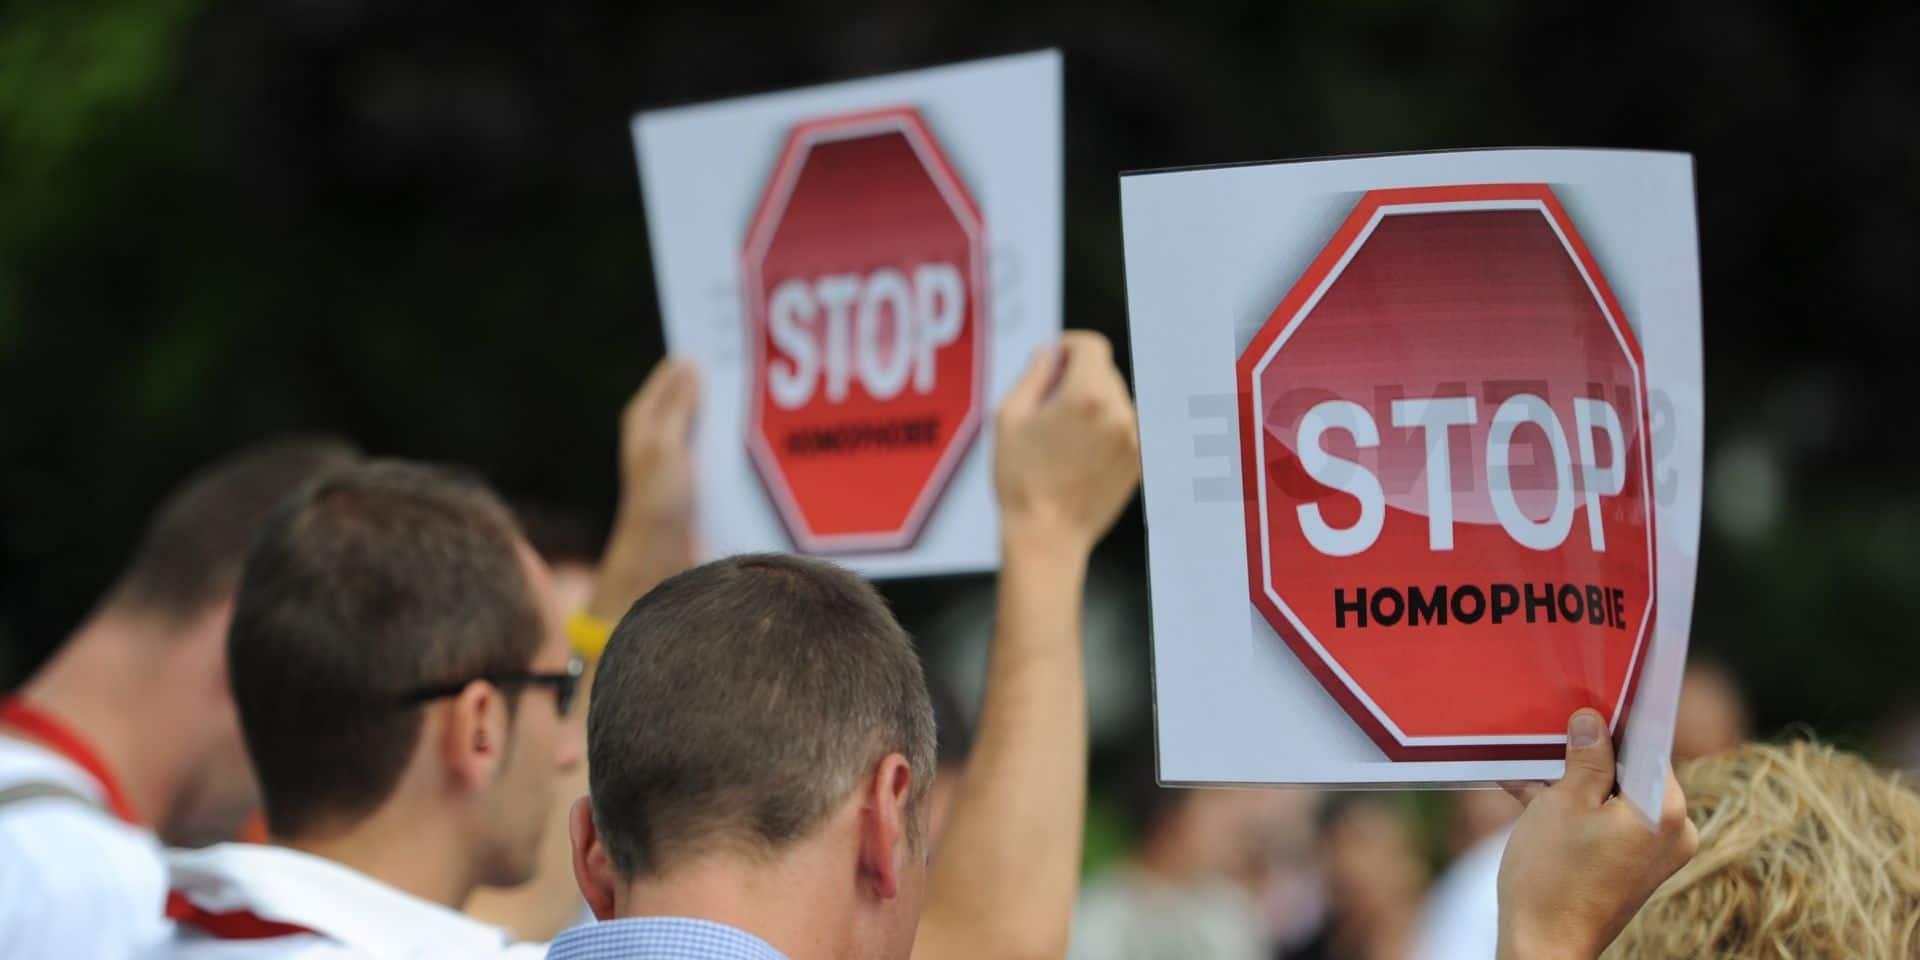 Plus de 1500 actes homophobes perpétrés en Belgique en dix ans